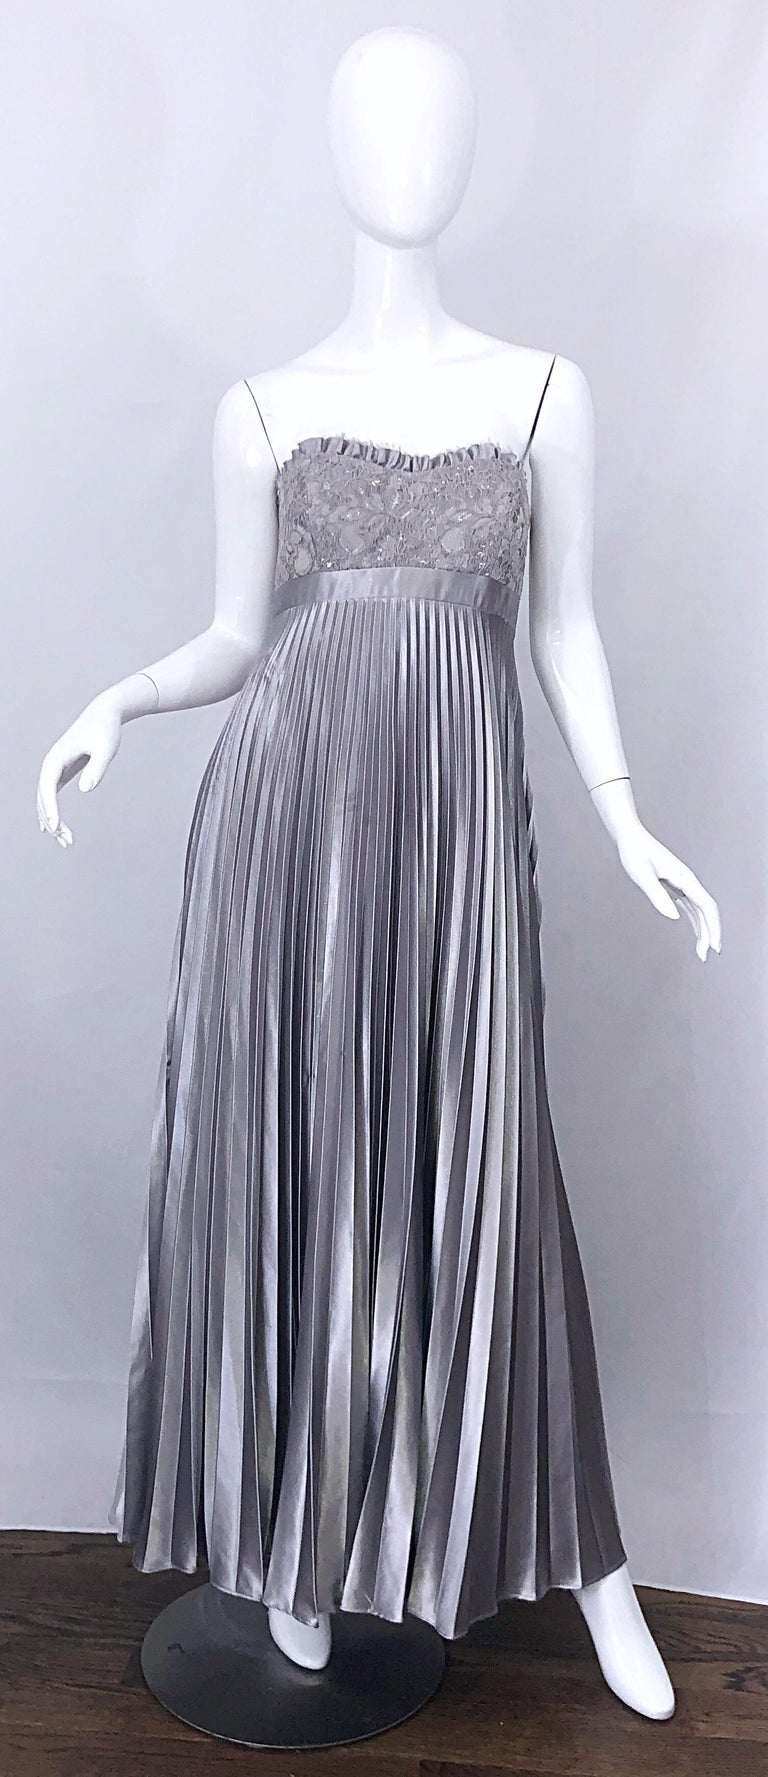 Beautiful Vintage Badgley Mischka Size 10 / 12 Silver Metallic Beaded Gown Dress For Sale 5